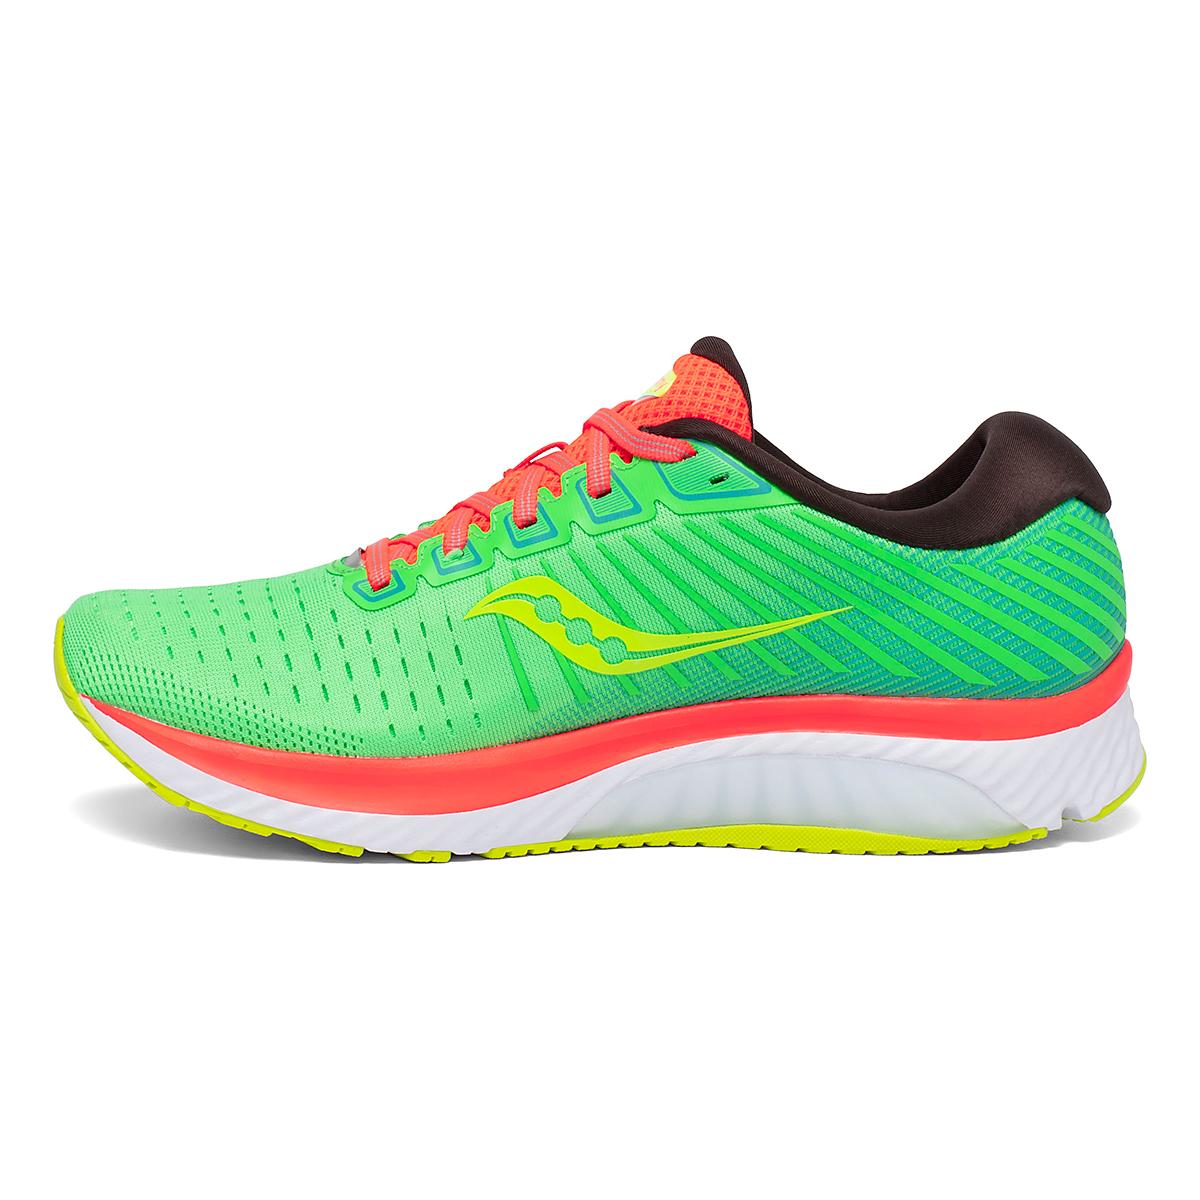 Men's Saucony Guide 13 Running Shoe - Color: Green Mutant - Size: 7 - Width: Regular, Green Mutant, large, image 2